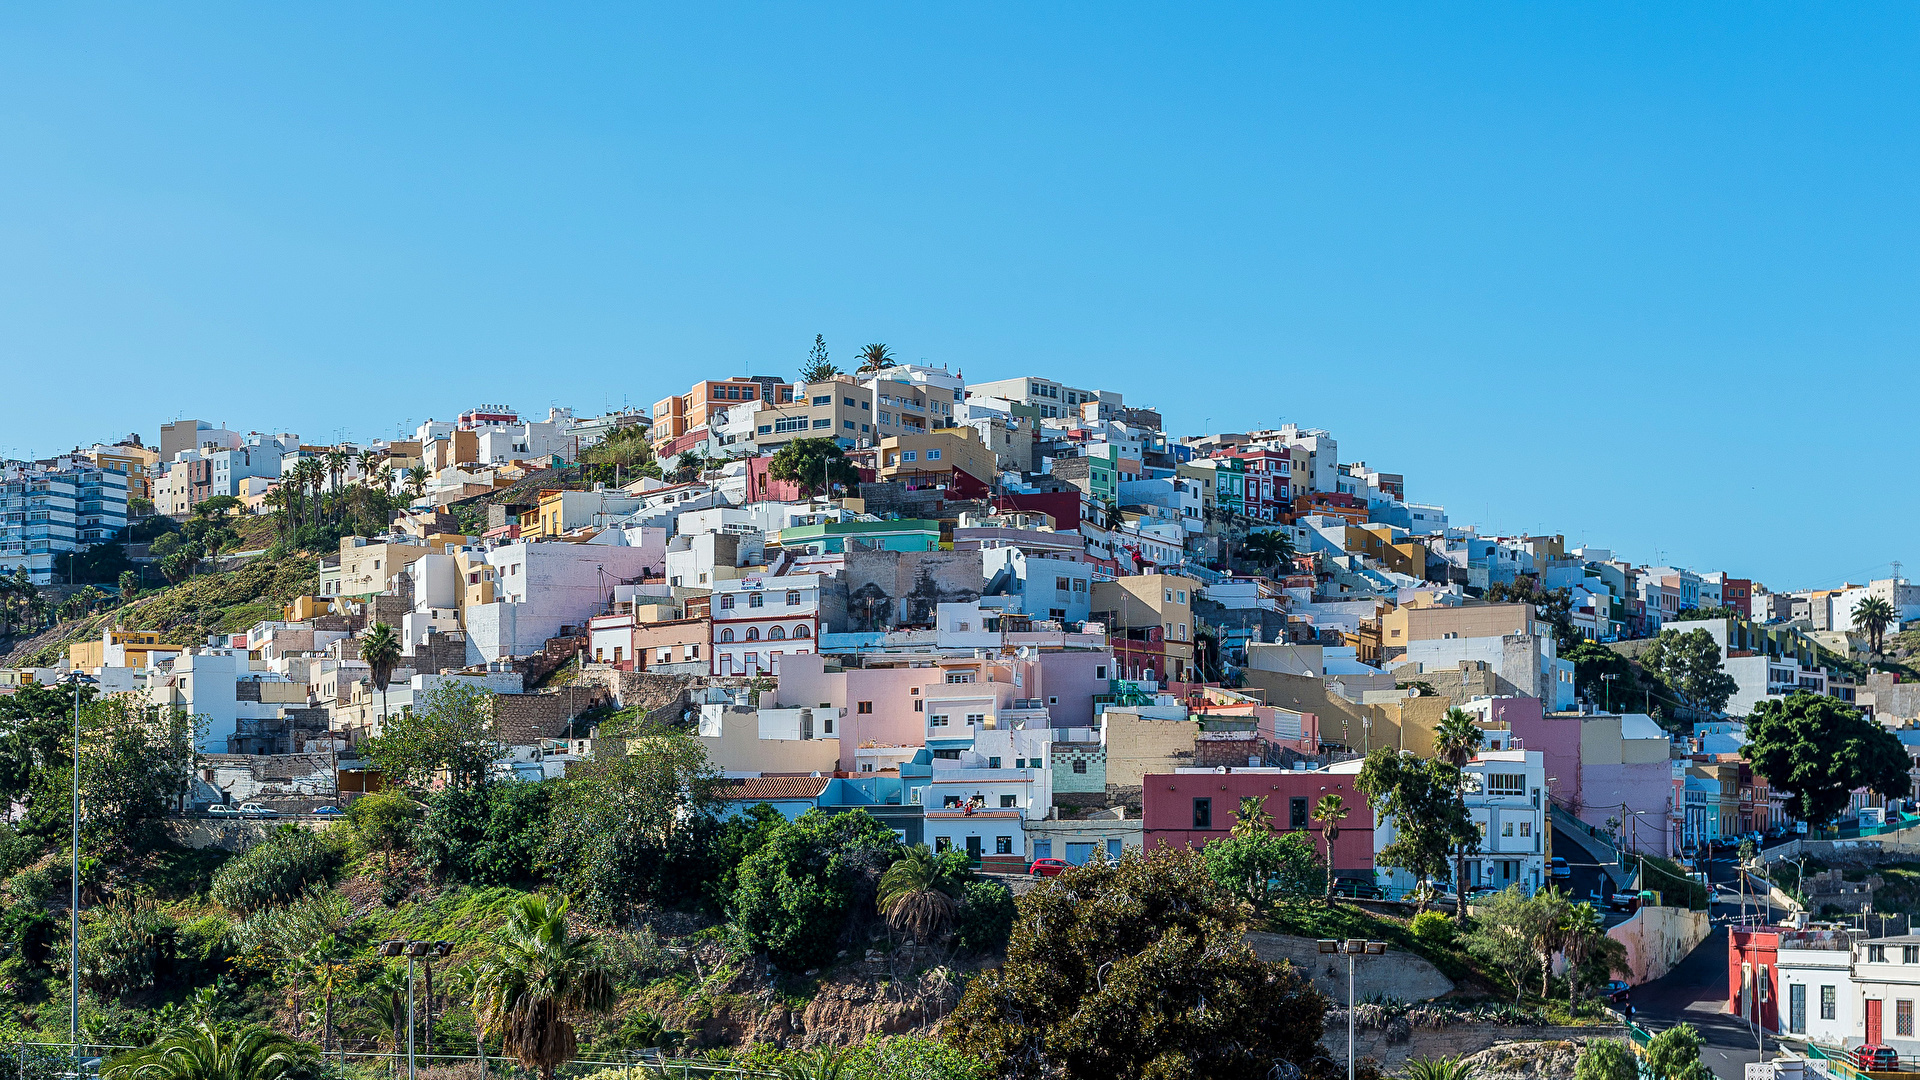 Free Download Wallpaper Spain Las Palmas Gran Canaria Cities